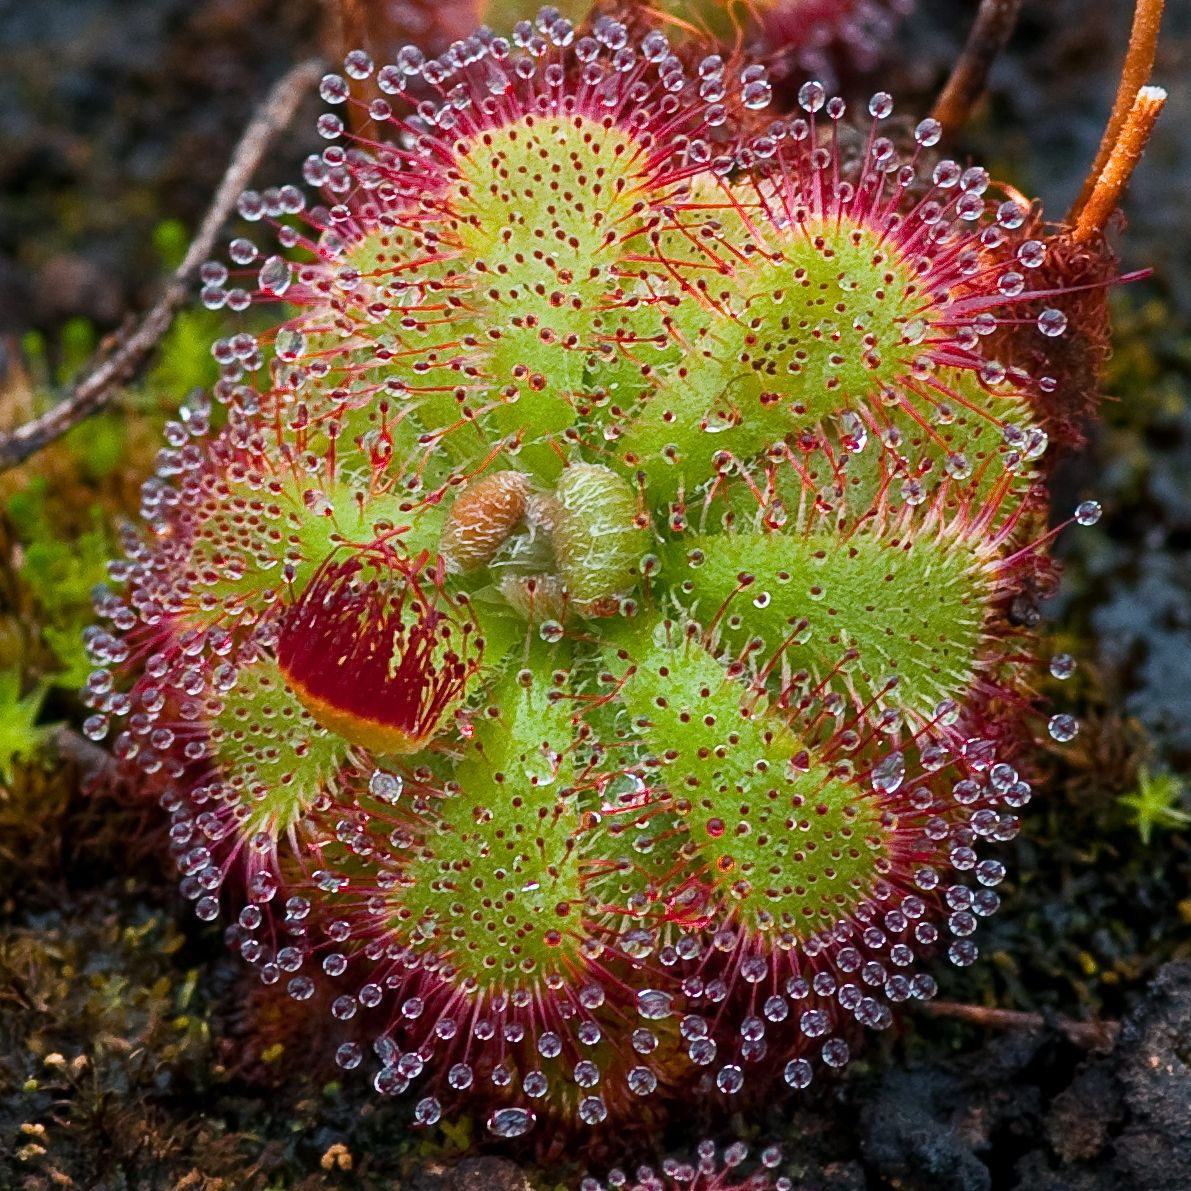 Drosera, a sundew plant Science & Nature Pinterest